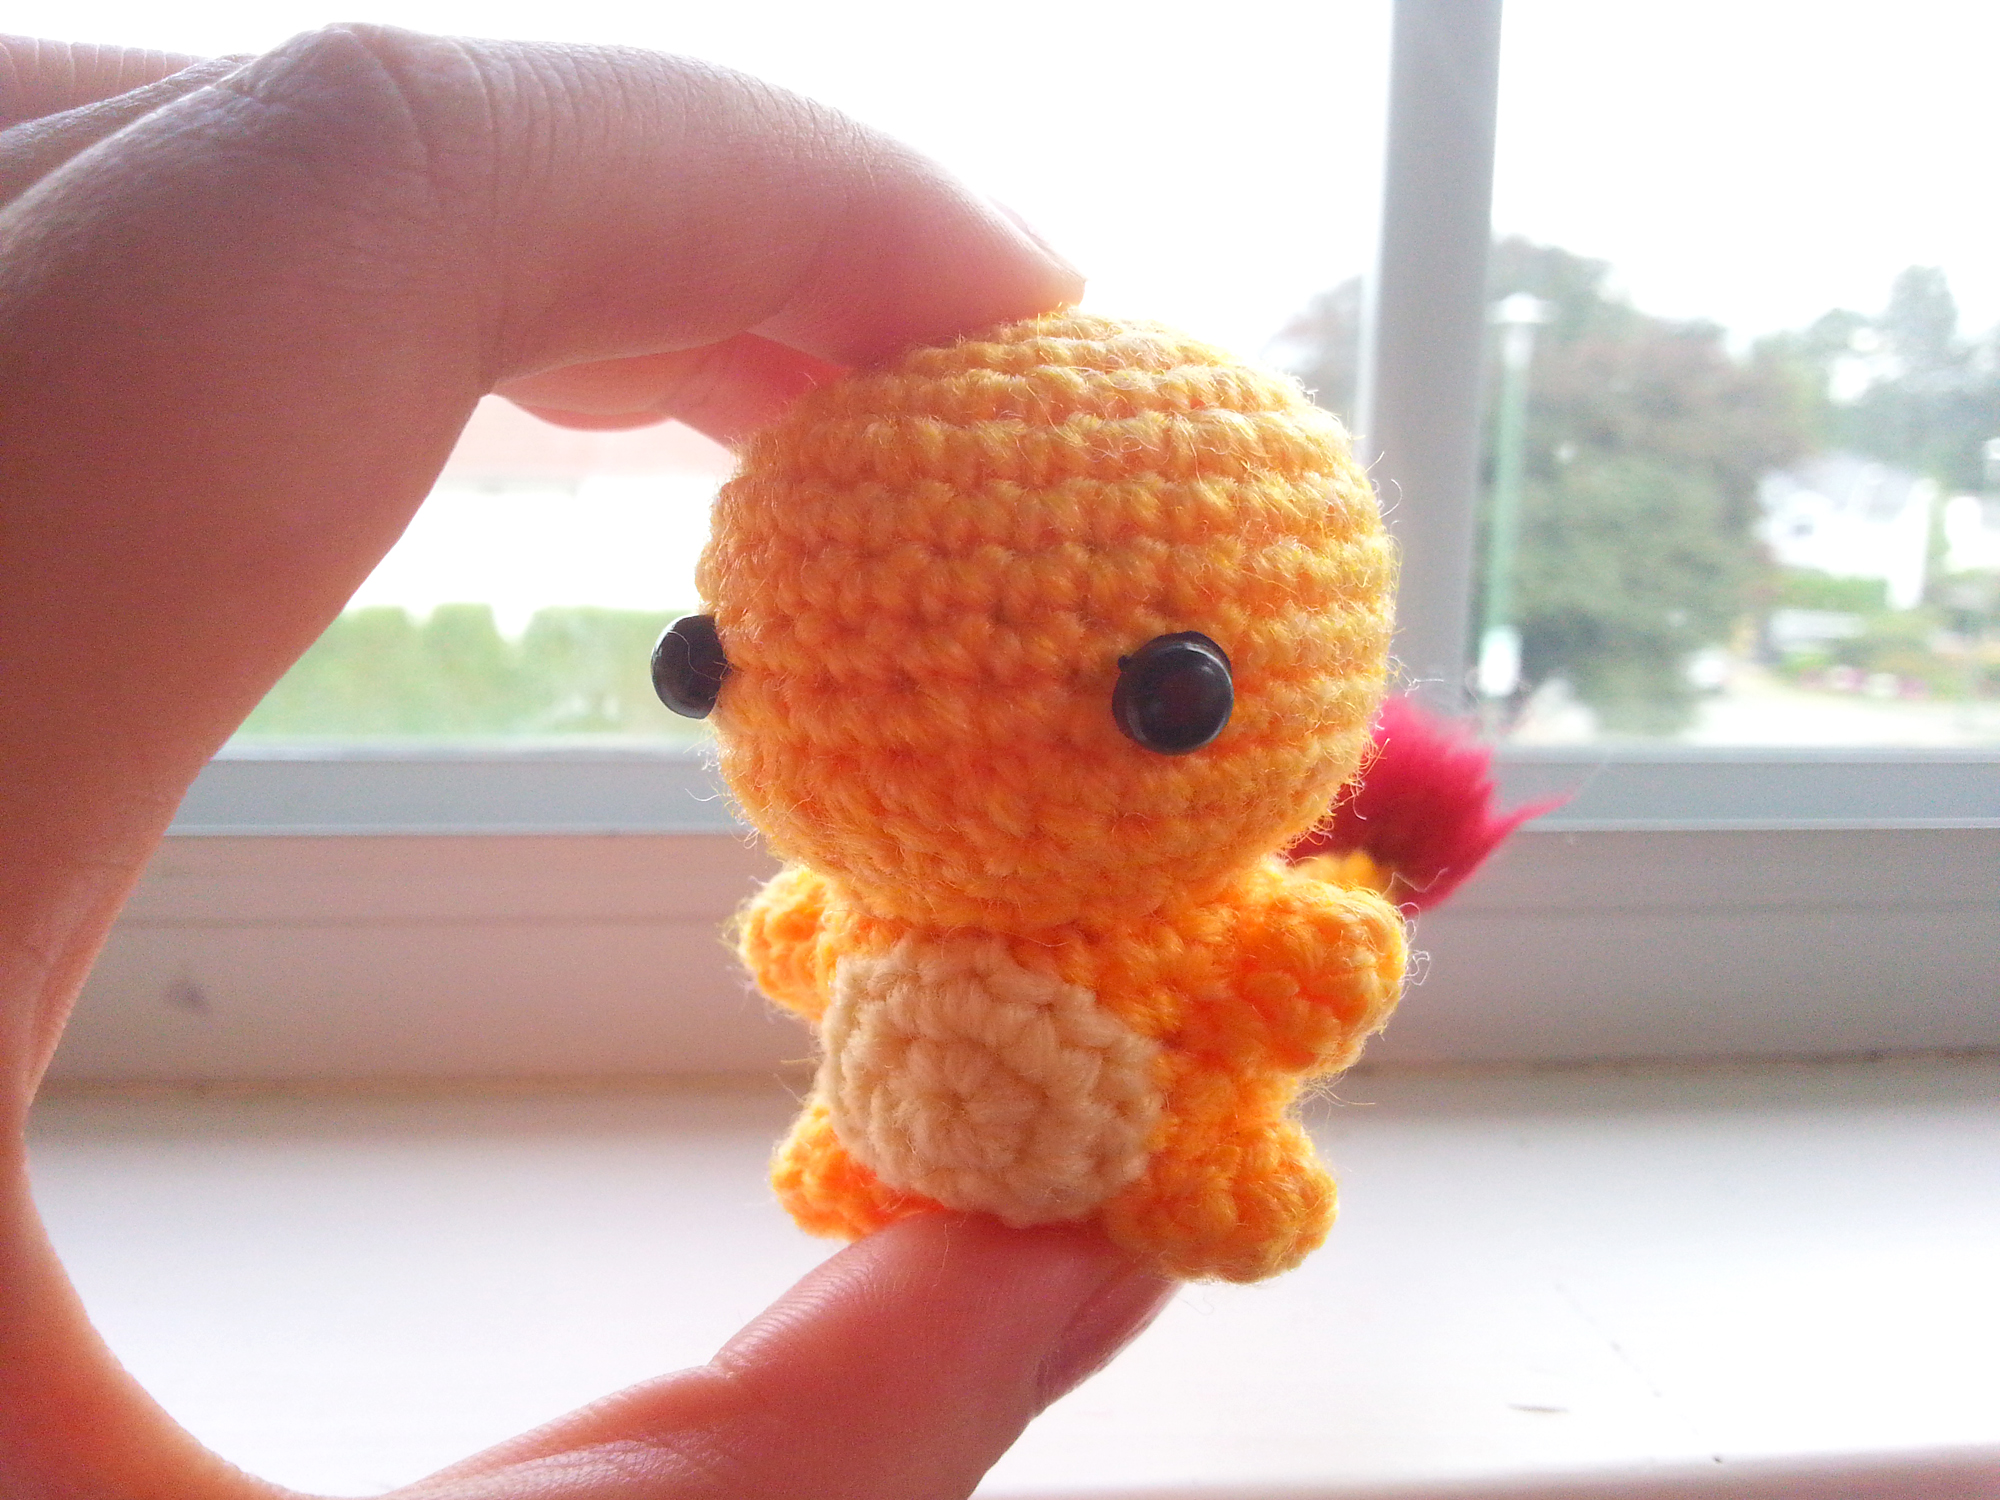 Amazon.com: Charizard Amigurumi/Crochet Stuffed Doll (Pokemon ... | 1500x2000